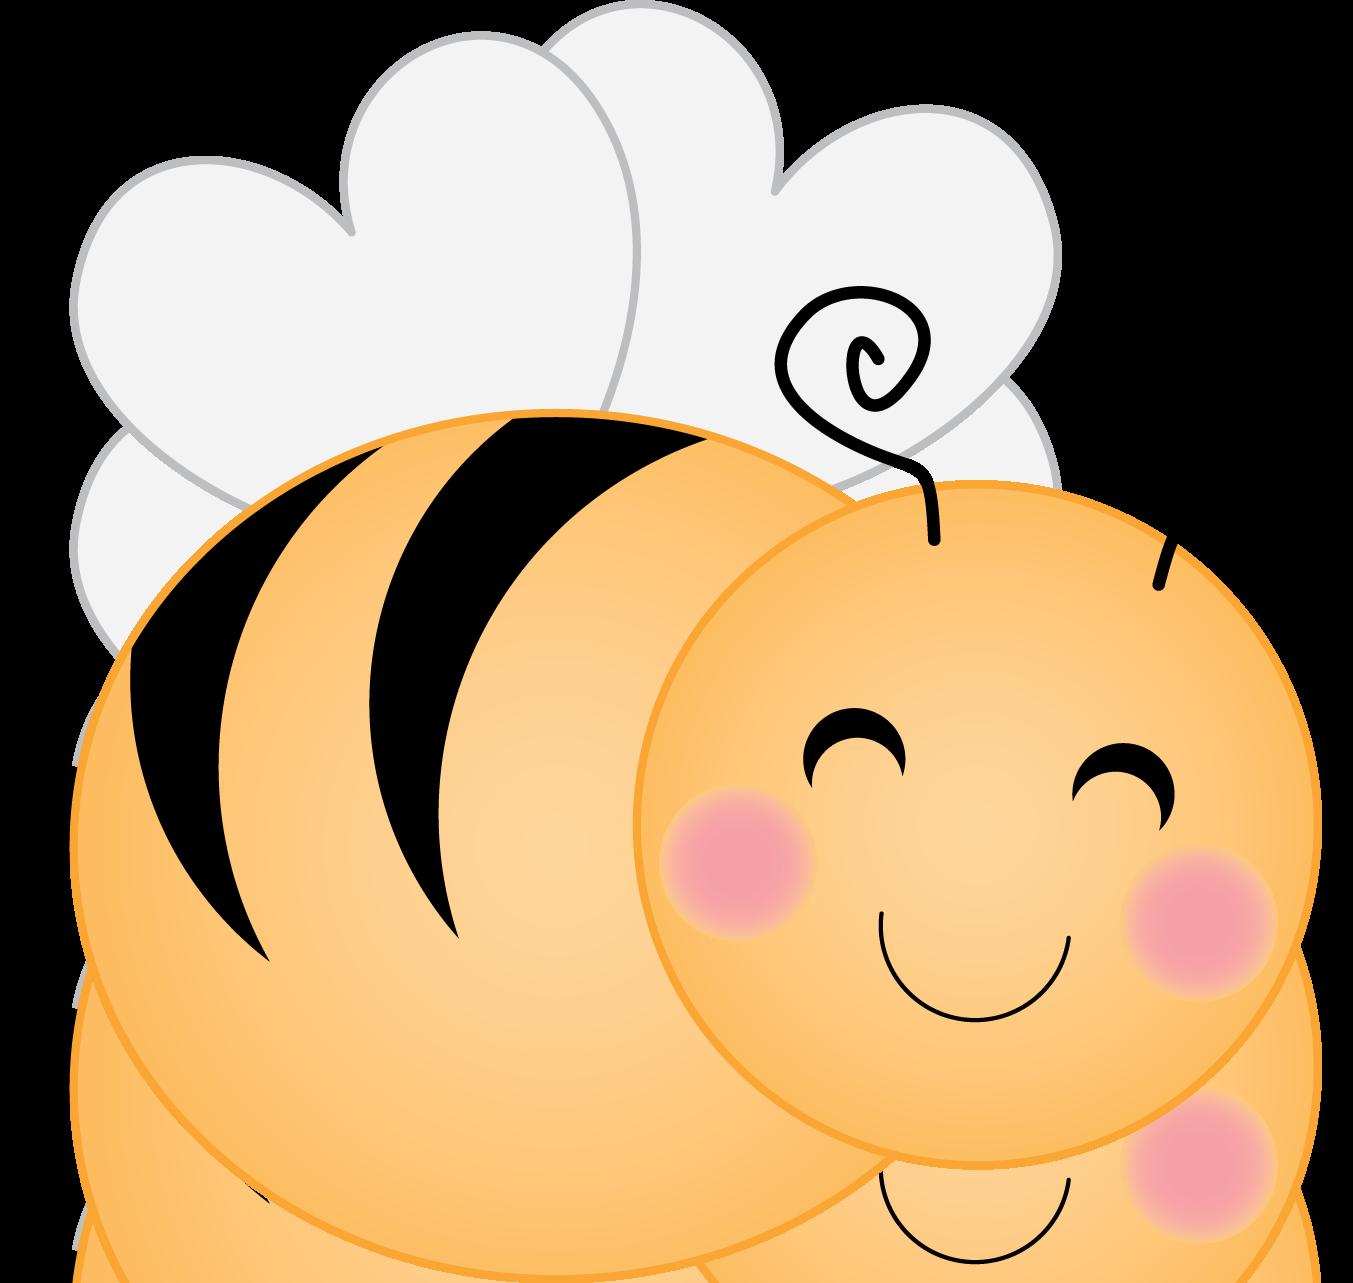 Abelhinhas bee png minus. Proud clipart 2nd